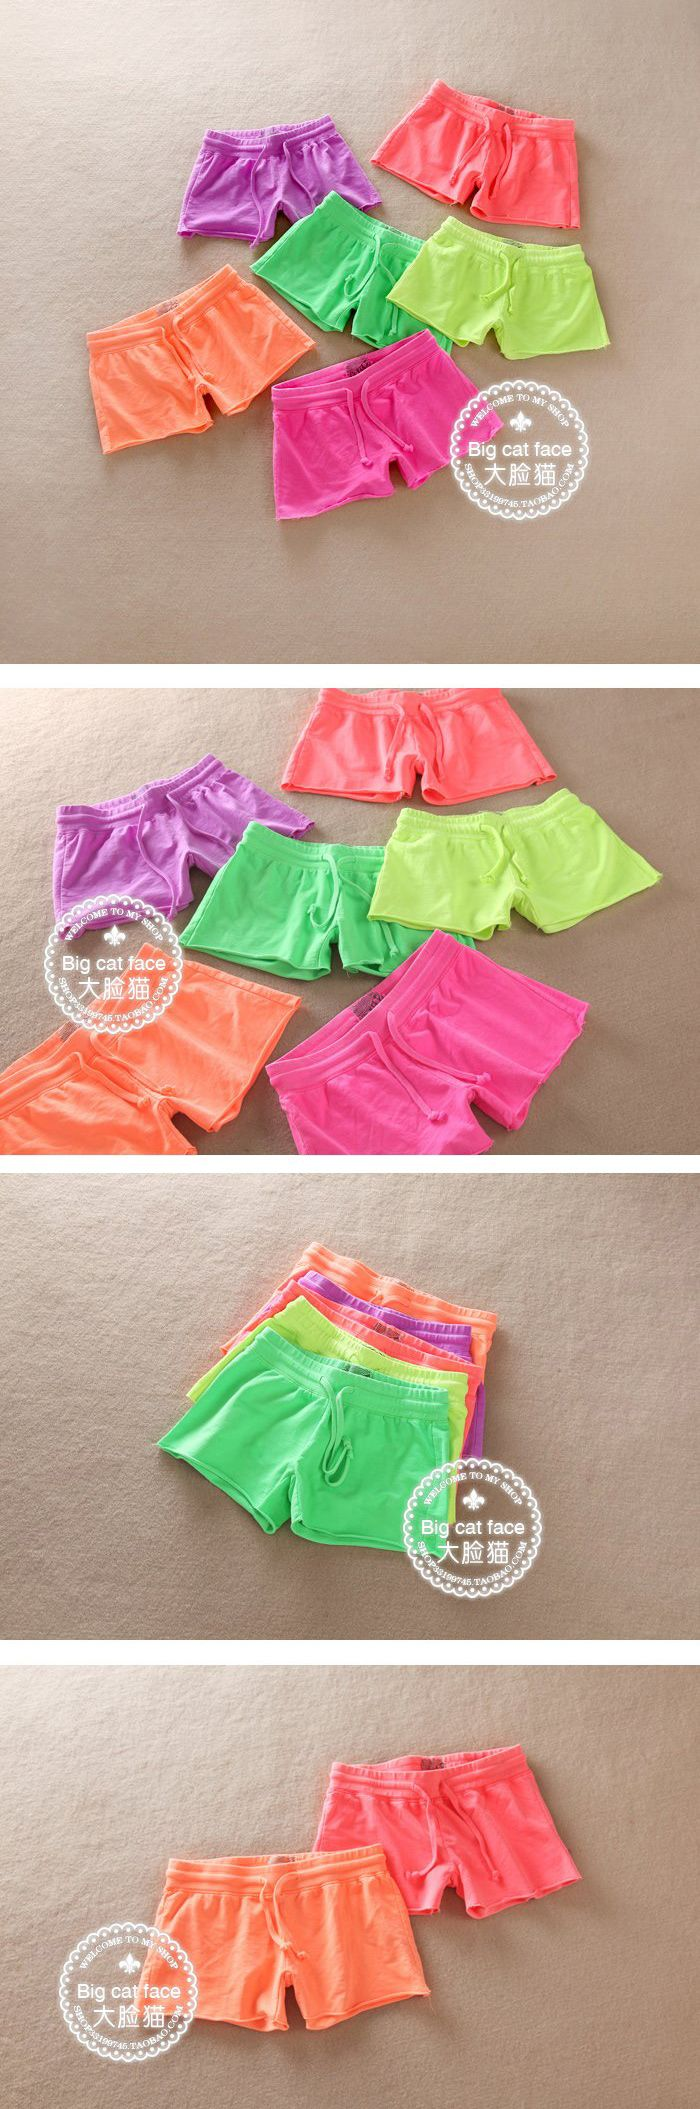 #taobao #shorts